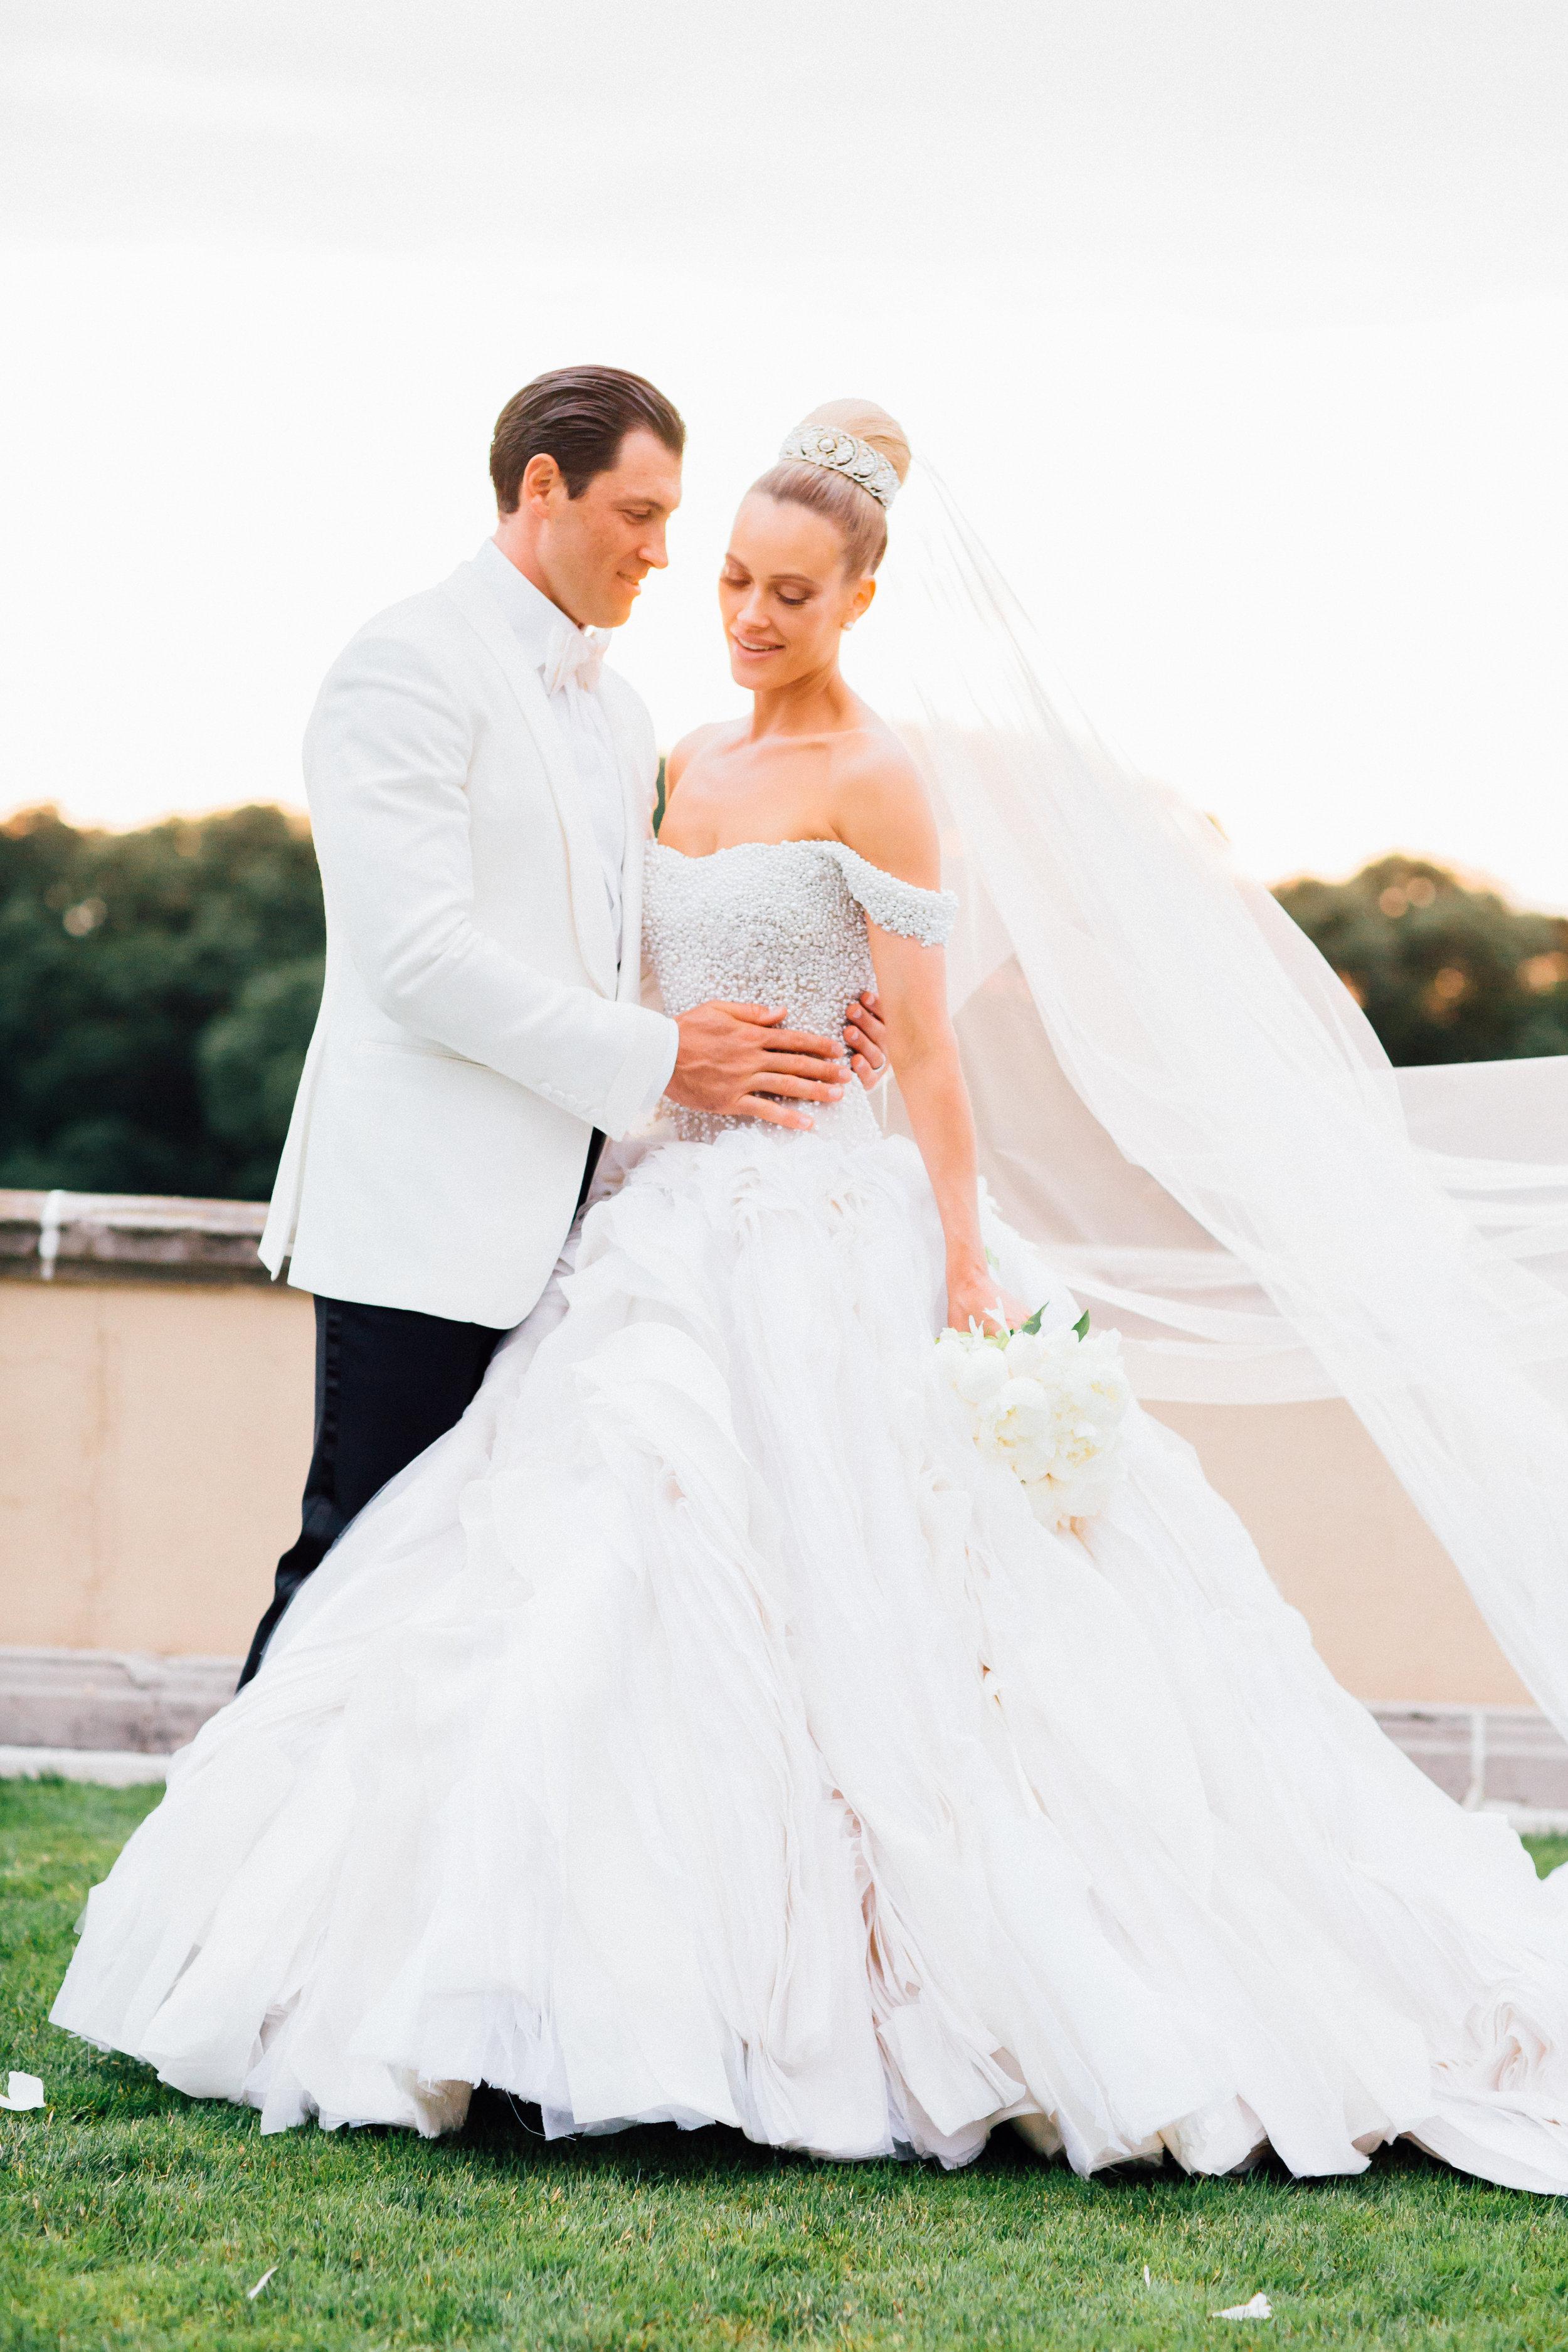 Peta Murgatroyd and Maksim Chmerkovskiy Wedding Jamie Levine Photography Oheka Castle 009.jpg